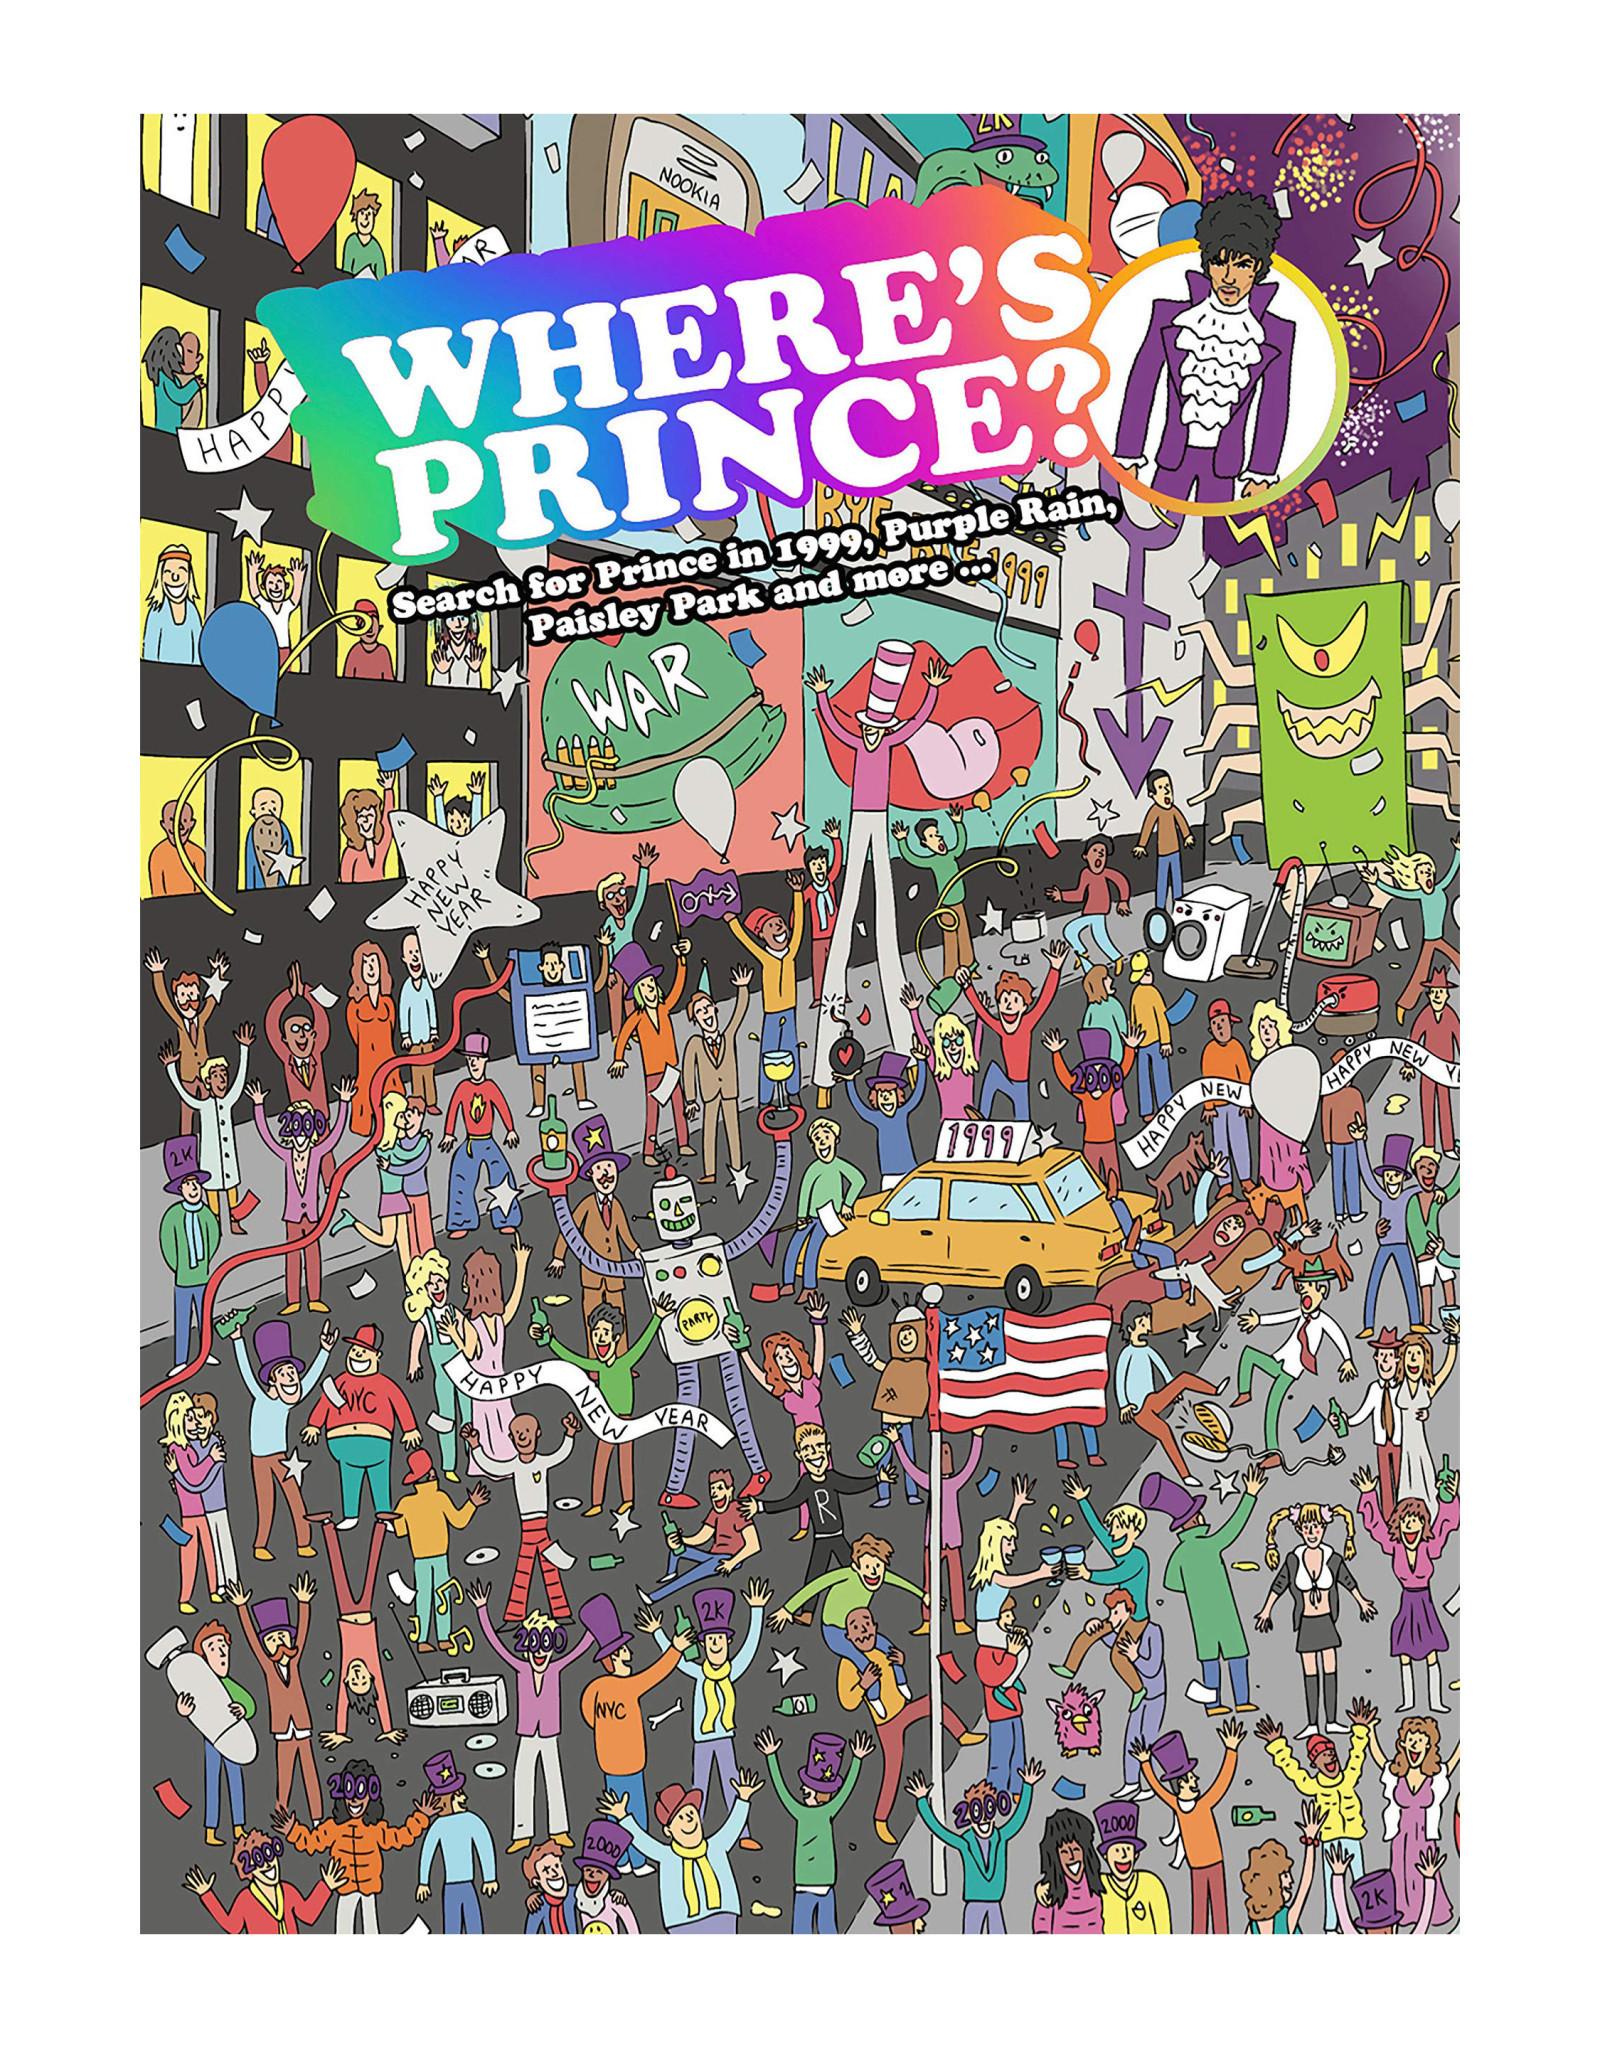 Where's Prince?